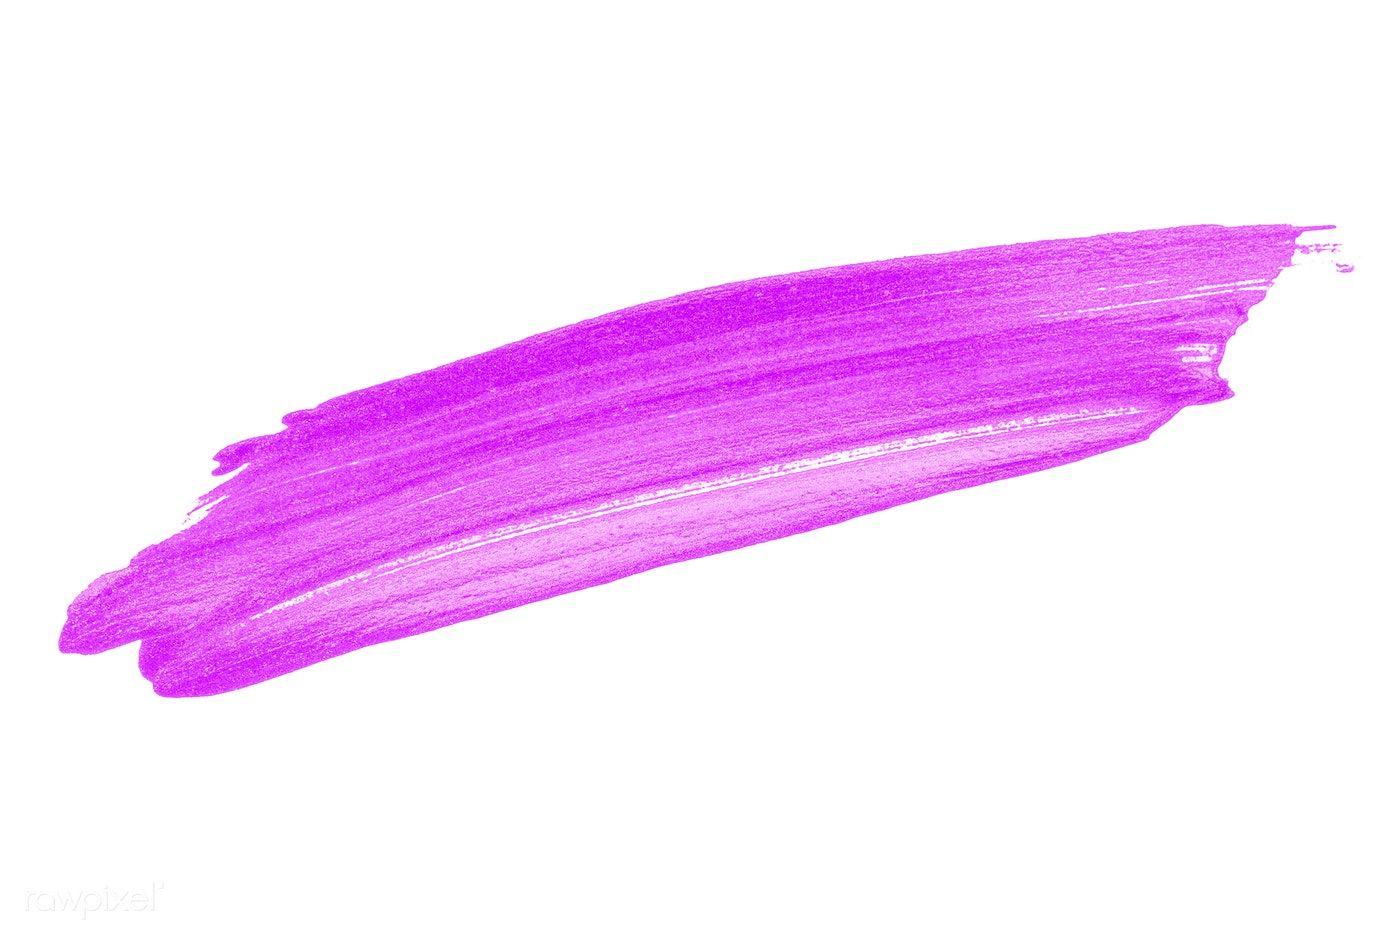 Festive Shimmery Purple Brush Stroke Free Image By Rawpixel Com Ake Brush Strokes Pink Brushes Brush Stroke Png